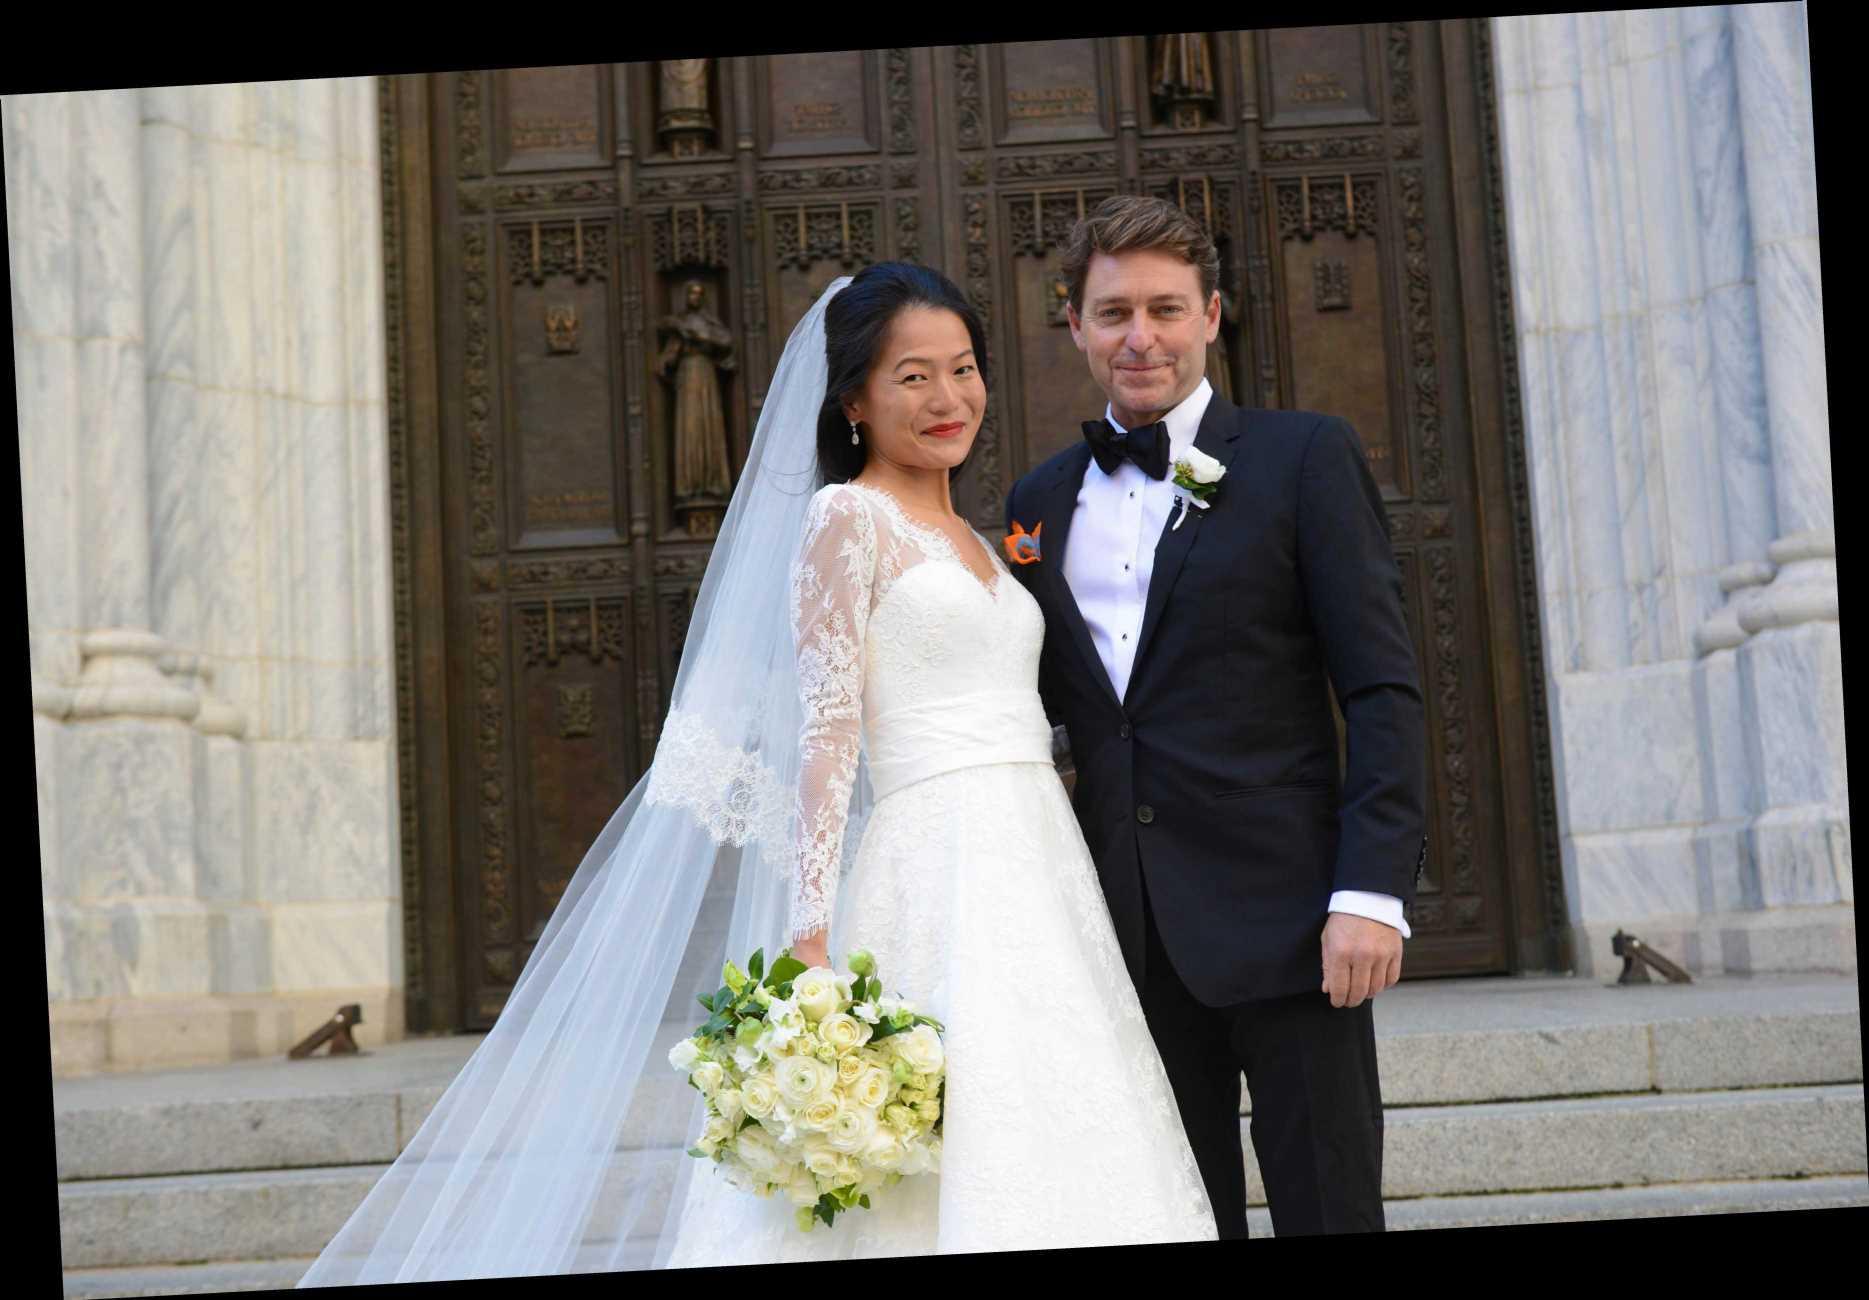 Ex-priest Fox News contributor Jonathan Morris marries Kaitlyn Folmer